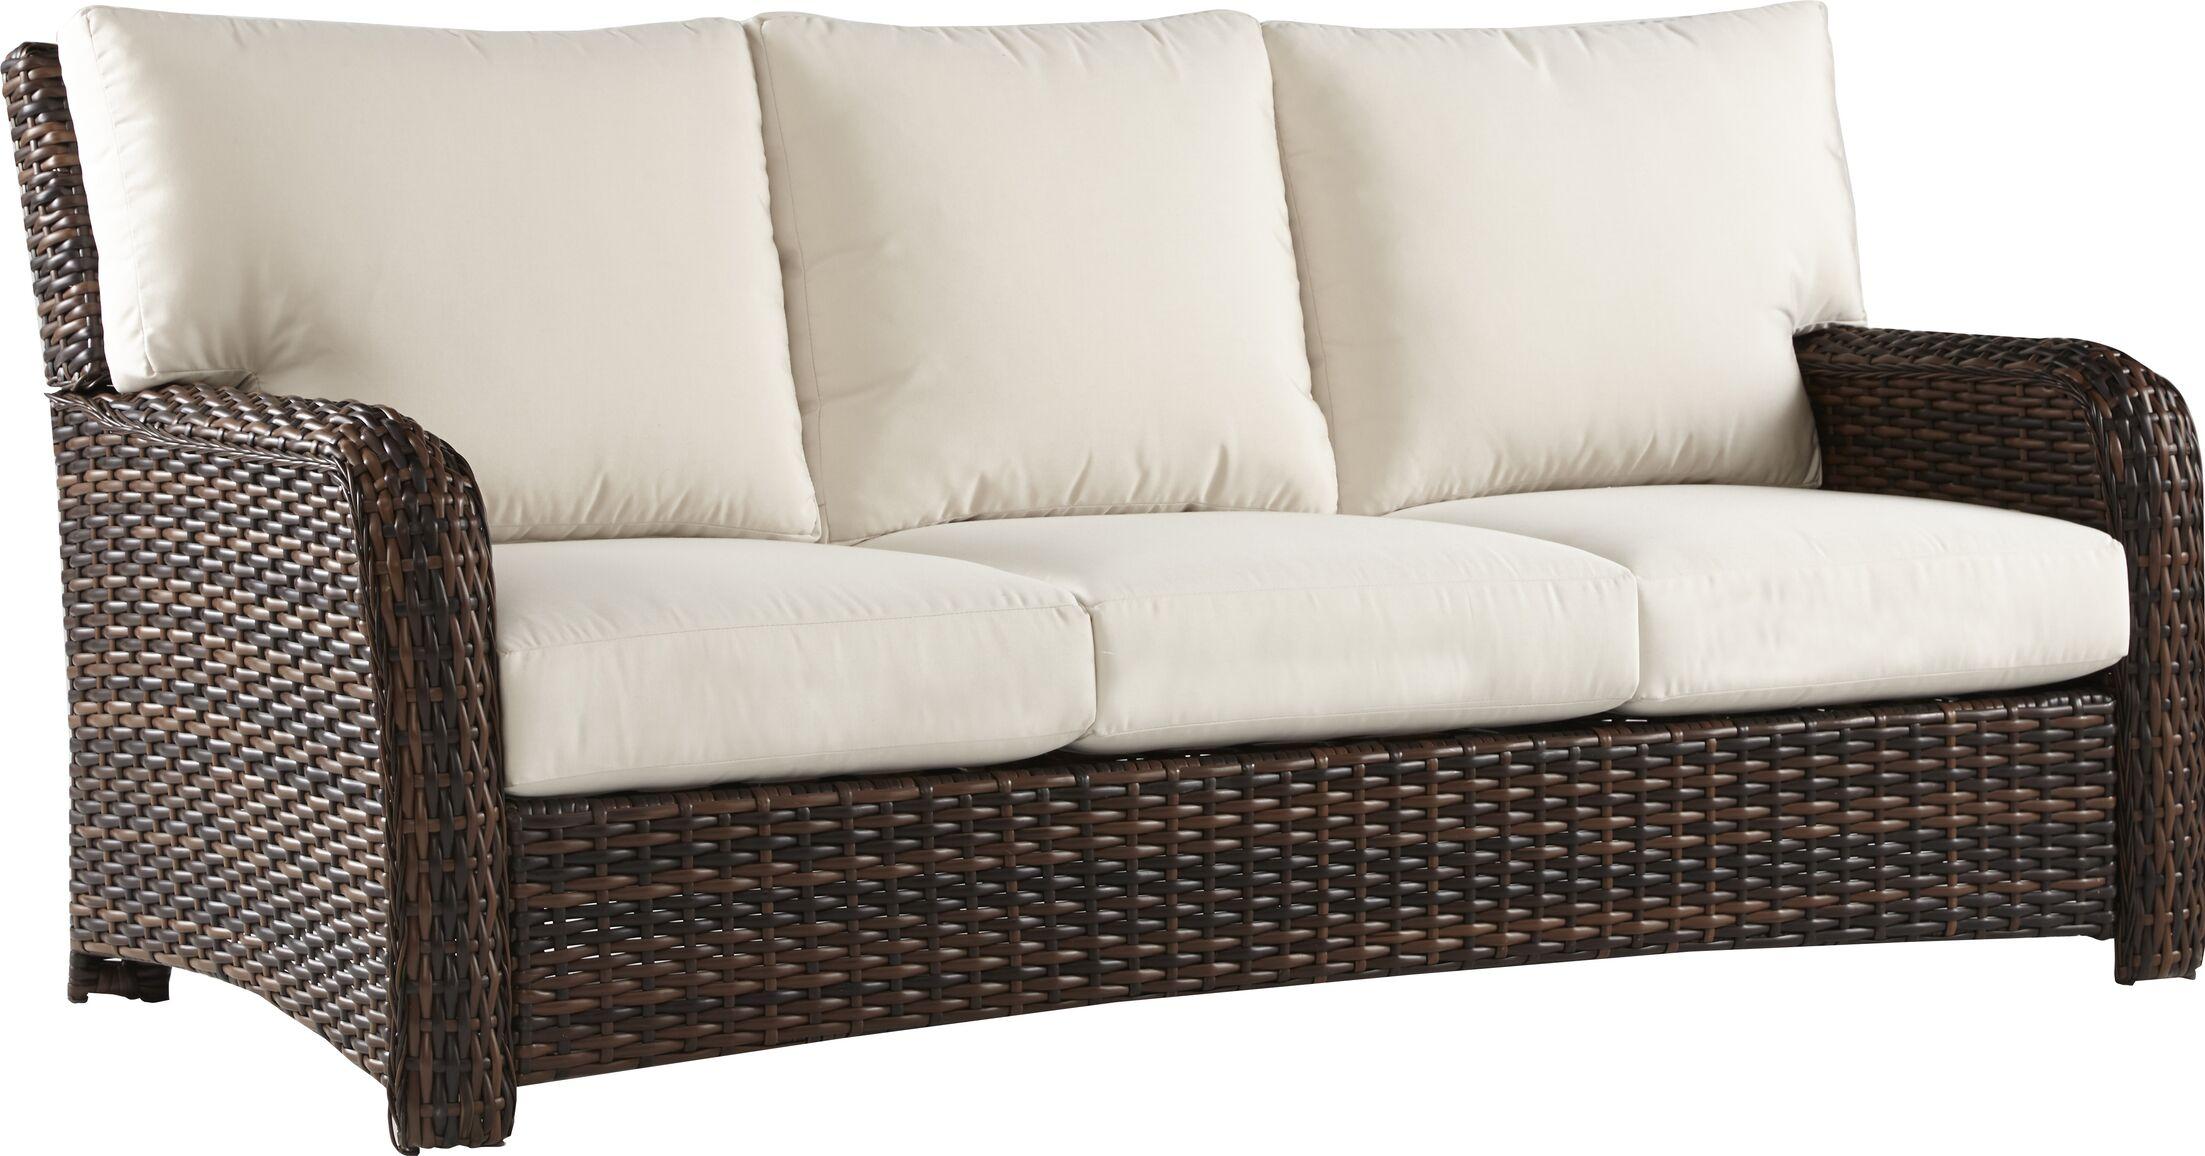 Chorio Sofa with Cushions Frame Color: Stone, Cushion Color: Cast Slate